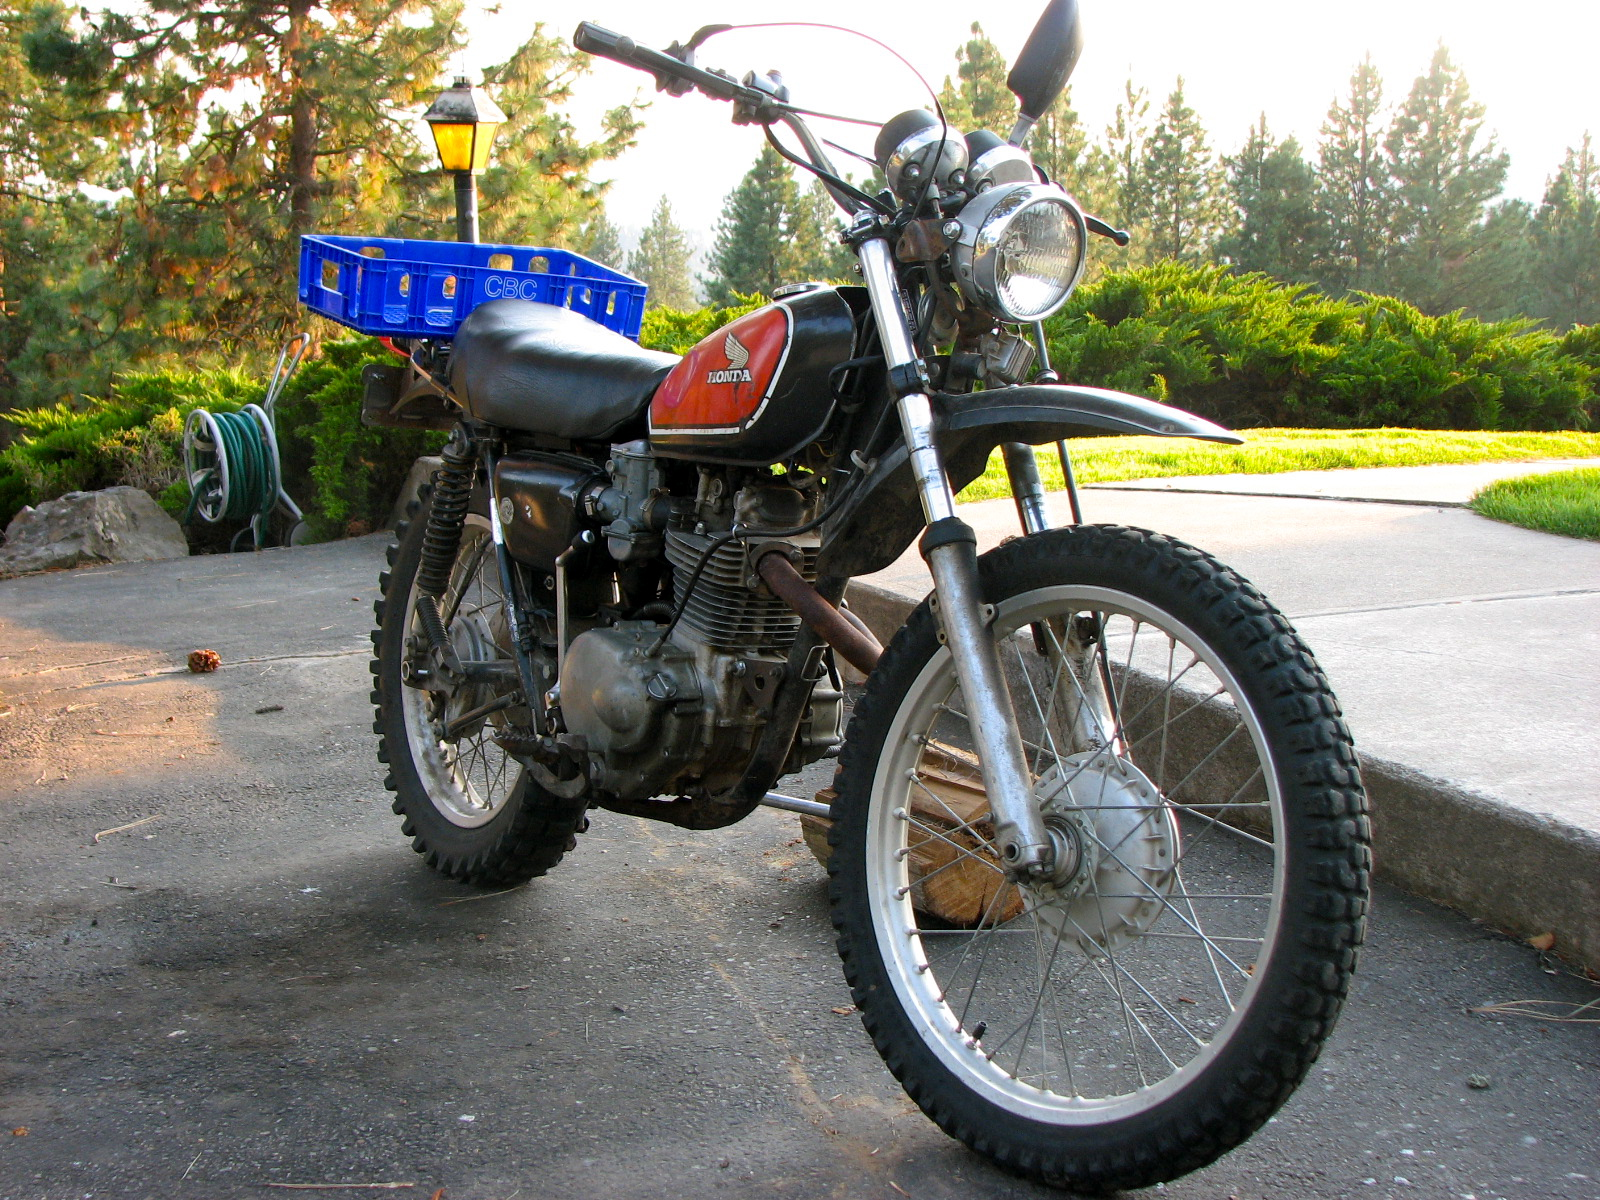 1975 honda xl250 975 located in coeur d 39 alene idaho for Honda coeur d alene